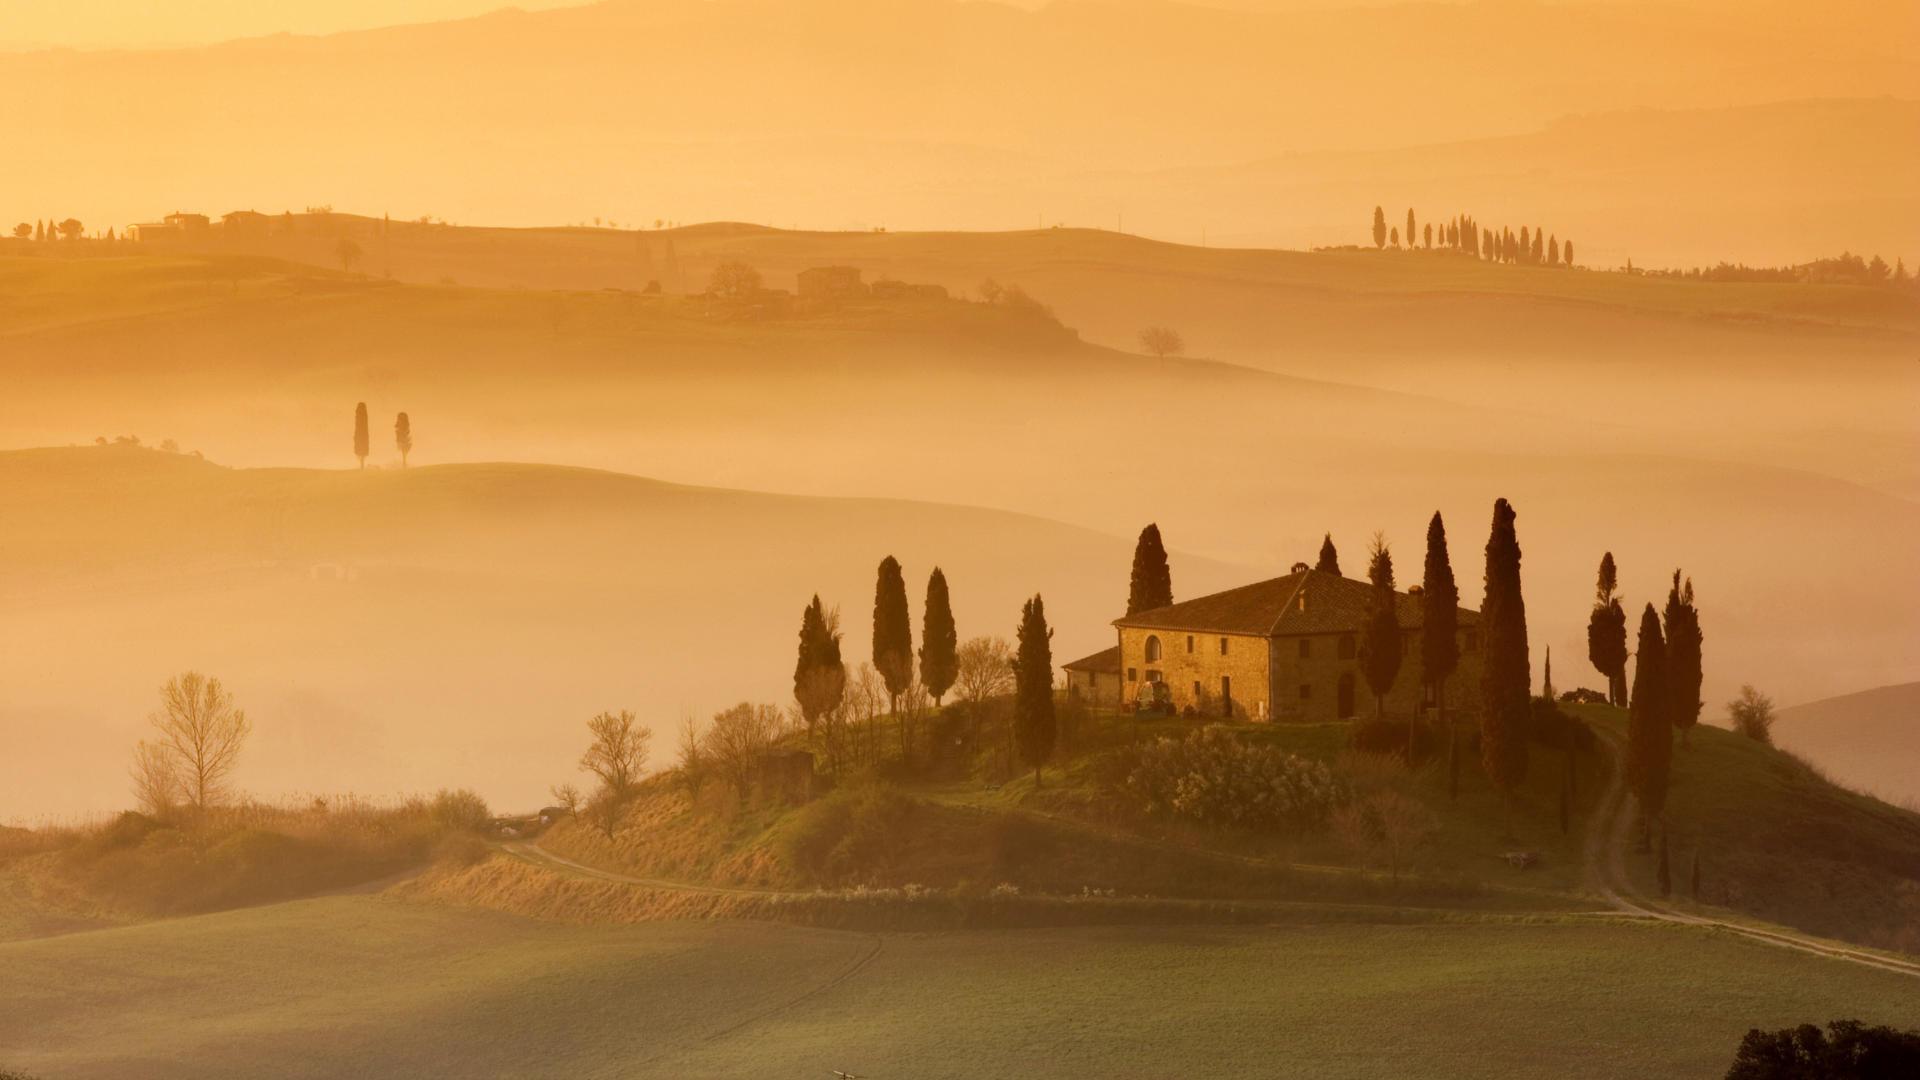 Tuscany Background 30325 1600x1000 px